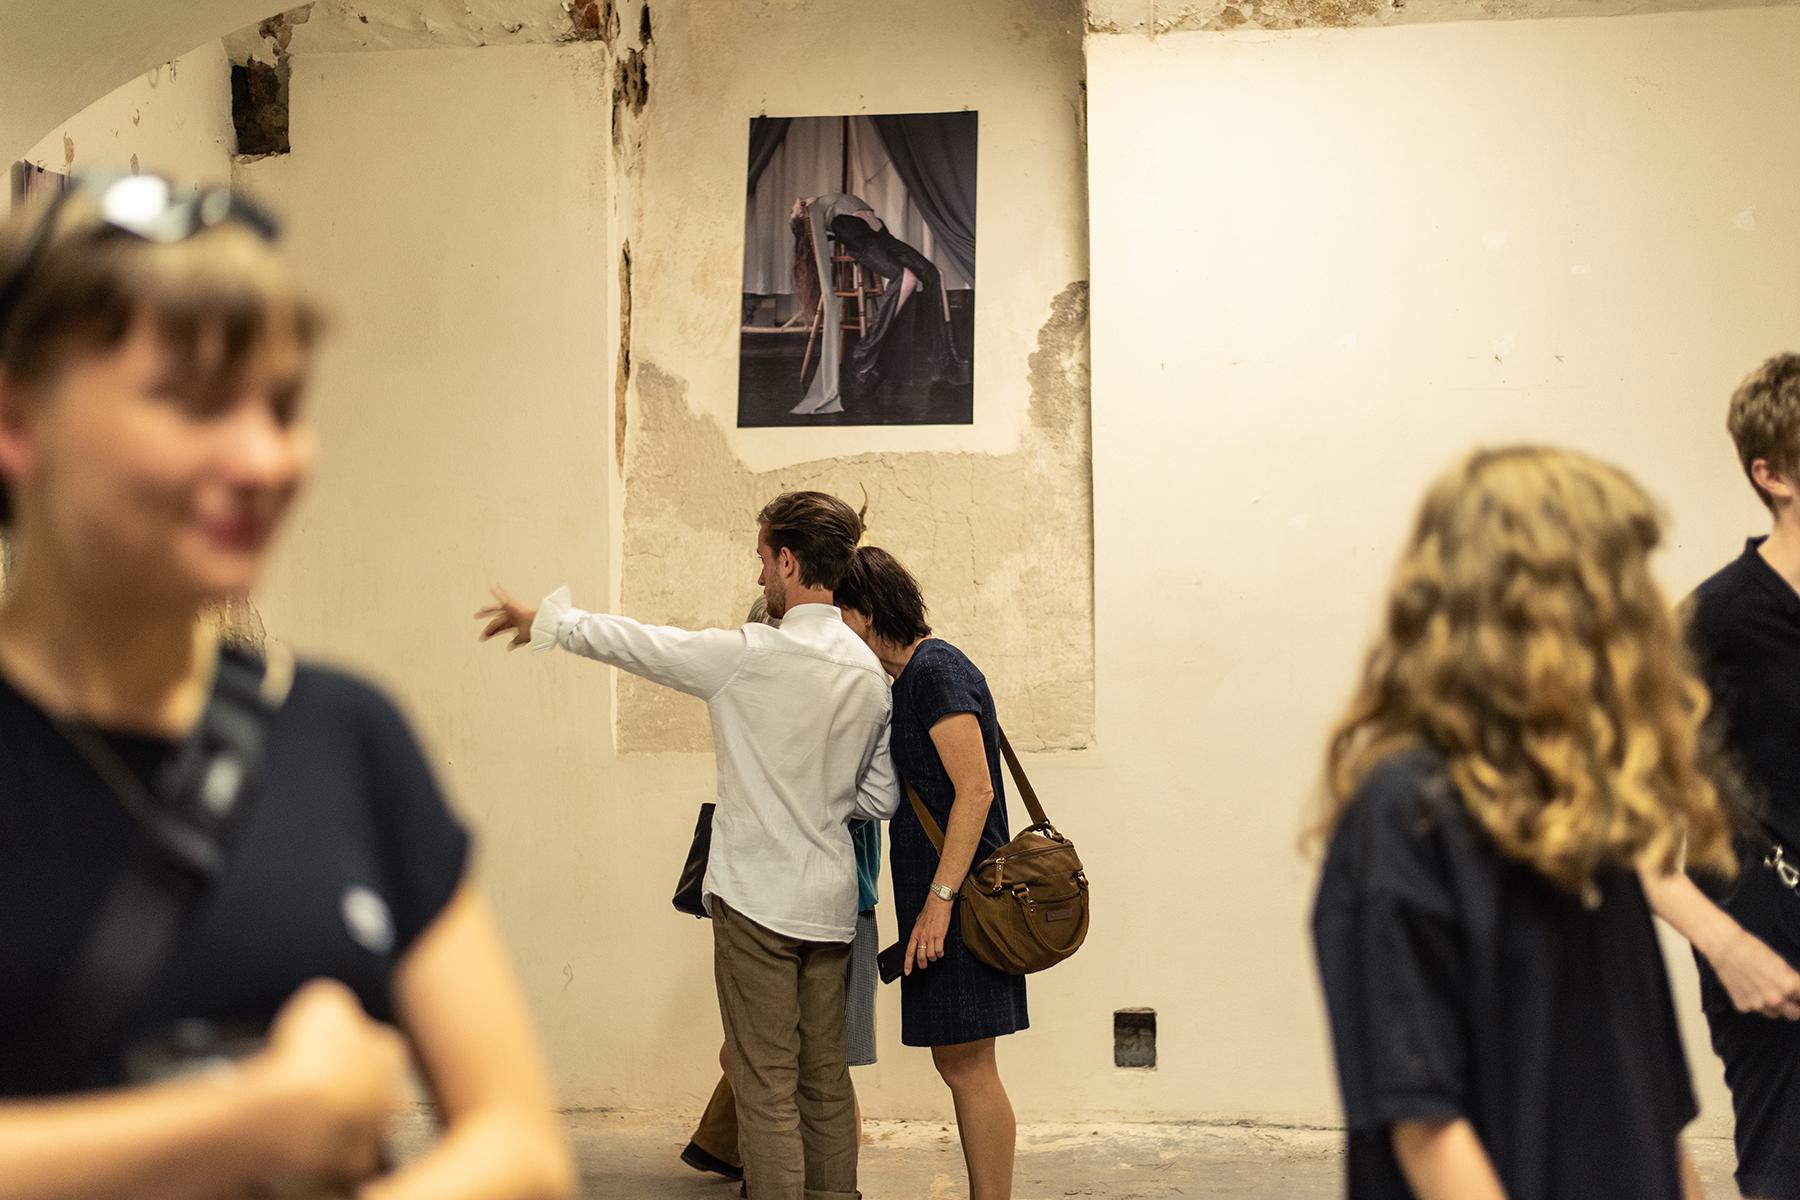 vernisáž výstavy<br>10—17. 7. 2021<br>Kampus Hybernská (998/4)<br>Sklep E